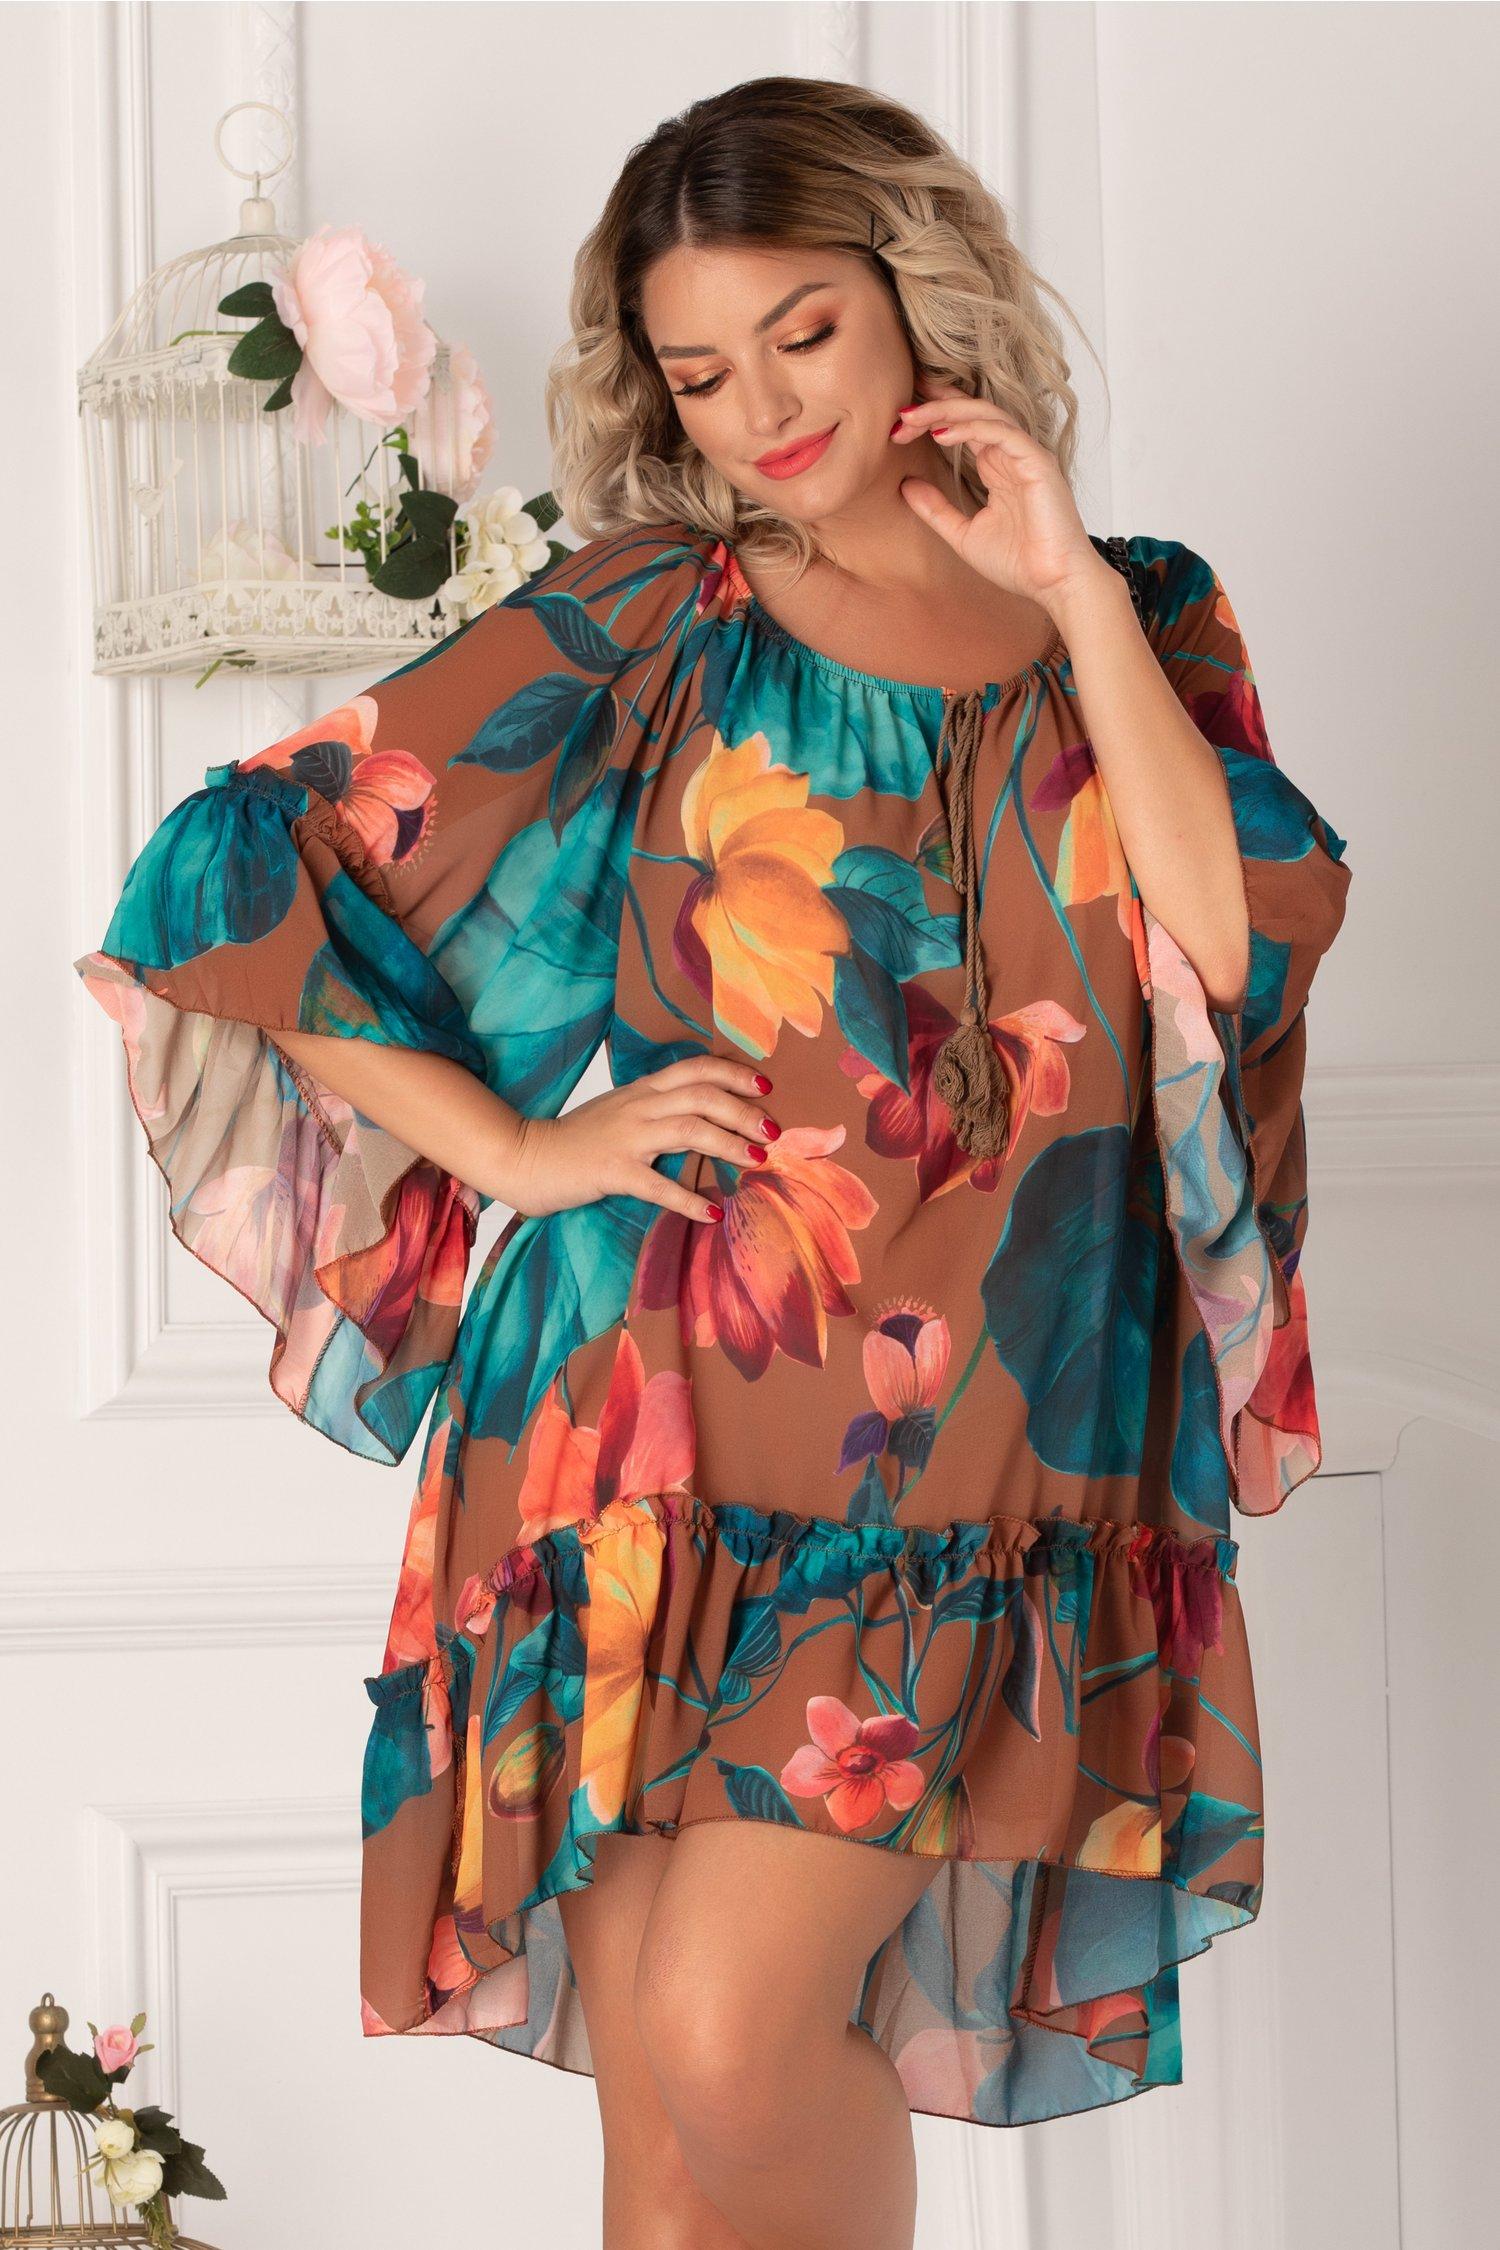 Rochie Sorina maro cu imprimeuri florale turcoaz